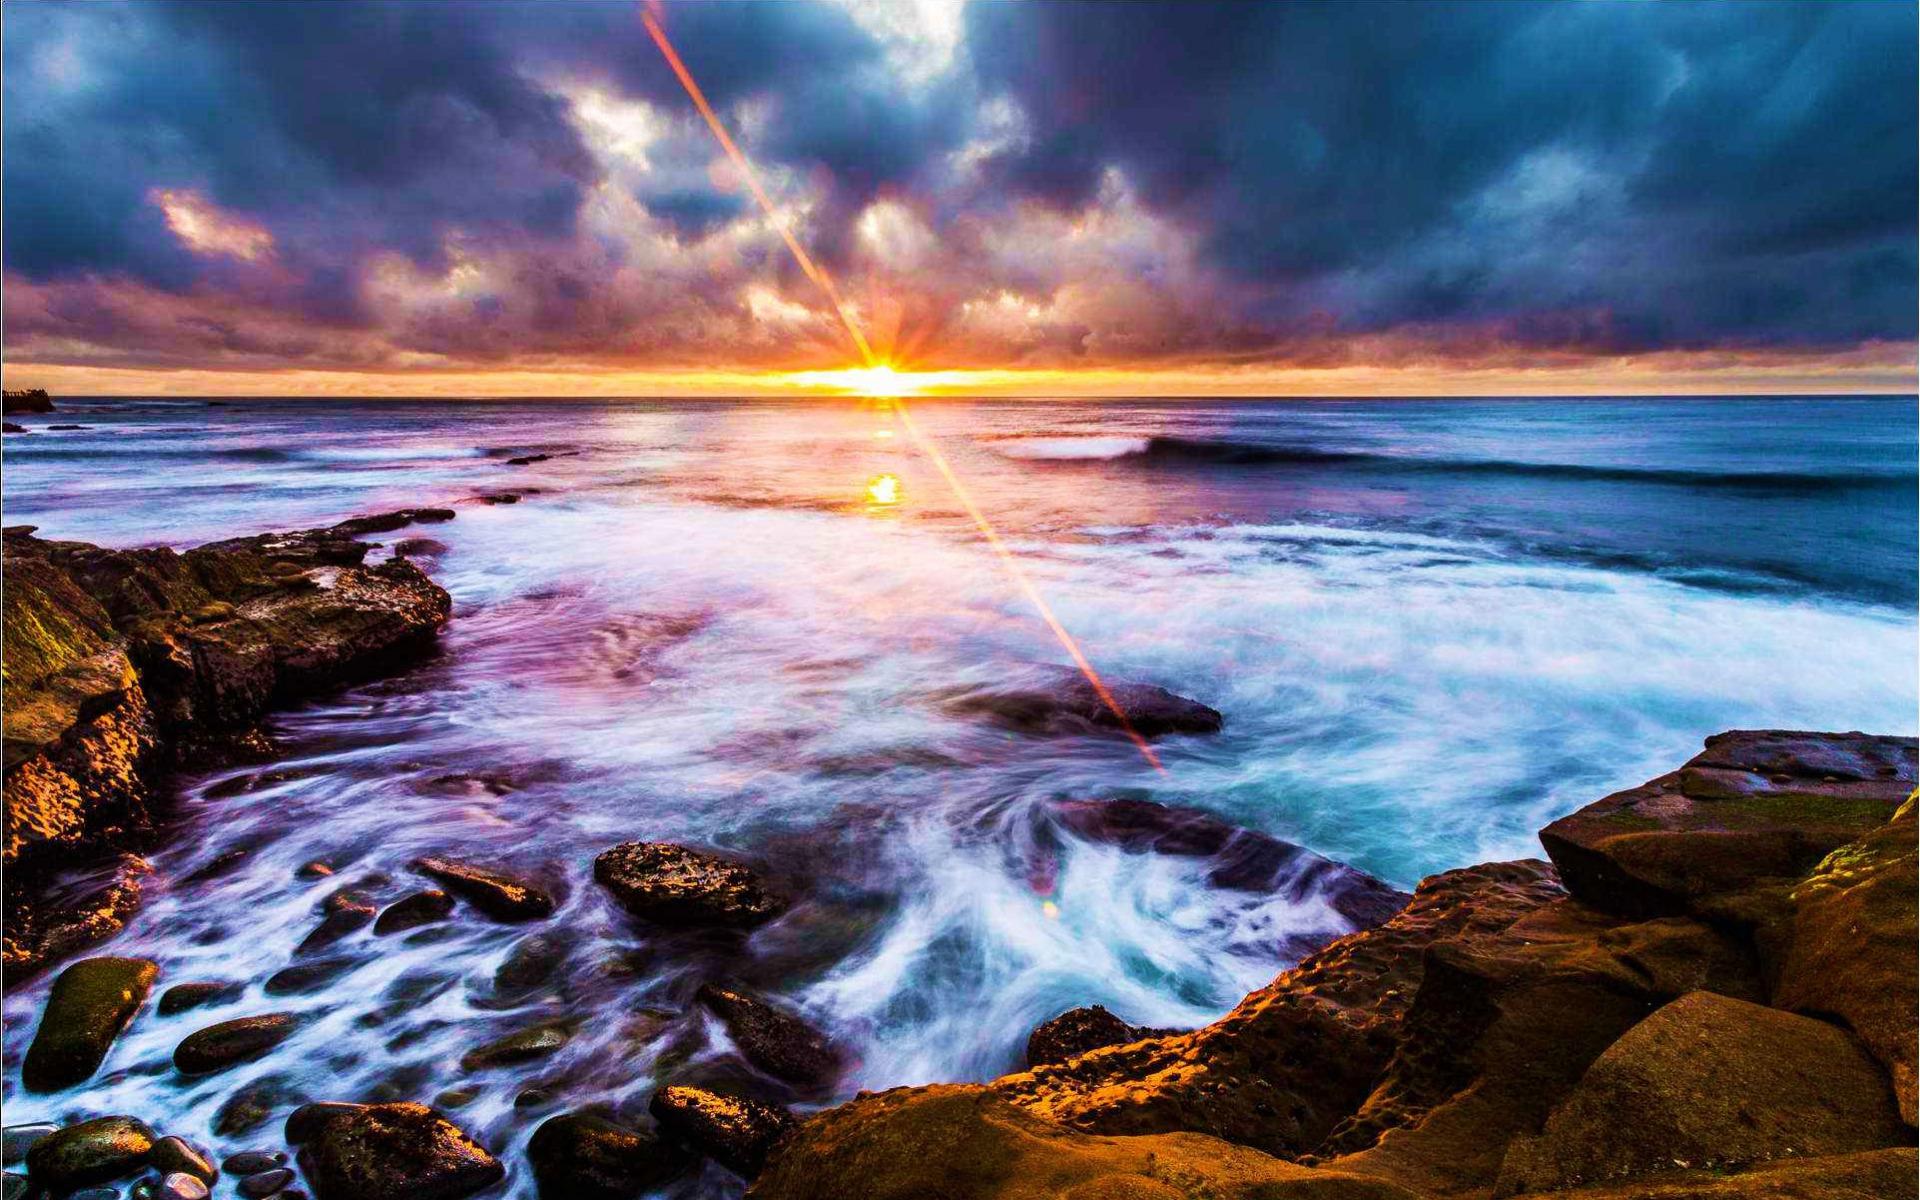 Gambar Wallpaper La Jolla Coastline Matahari Terbit dan Terbenam 1920x1200